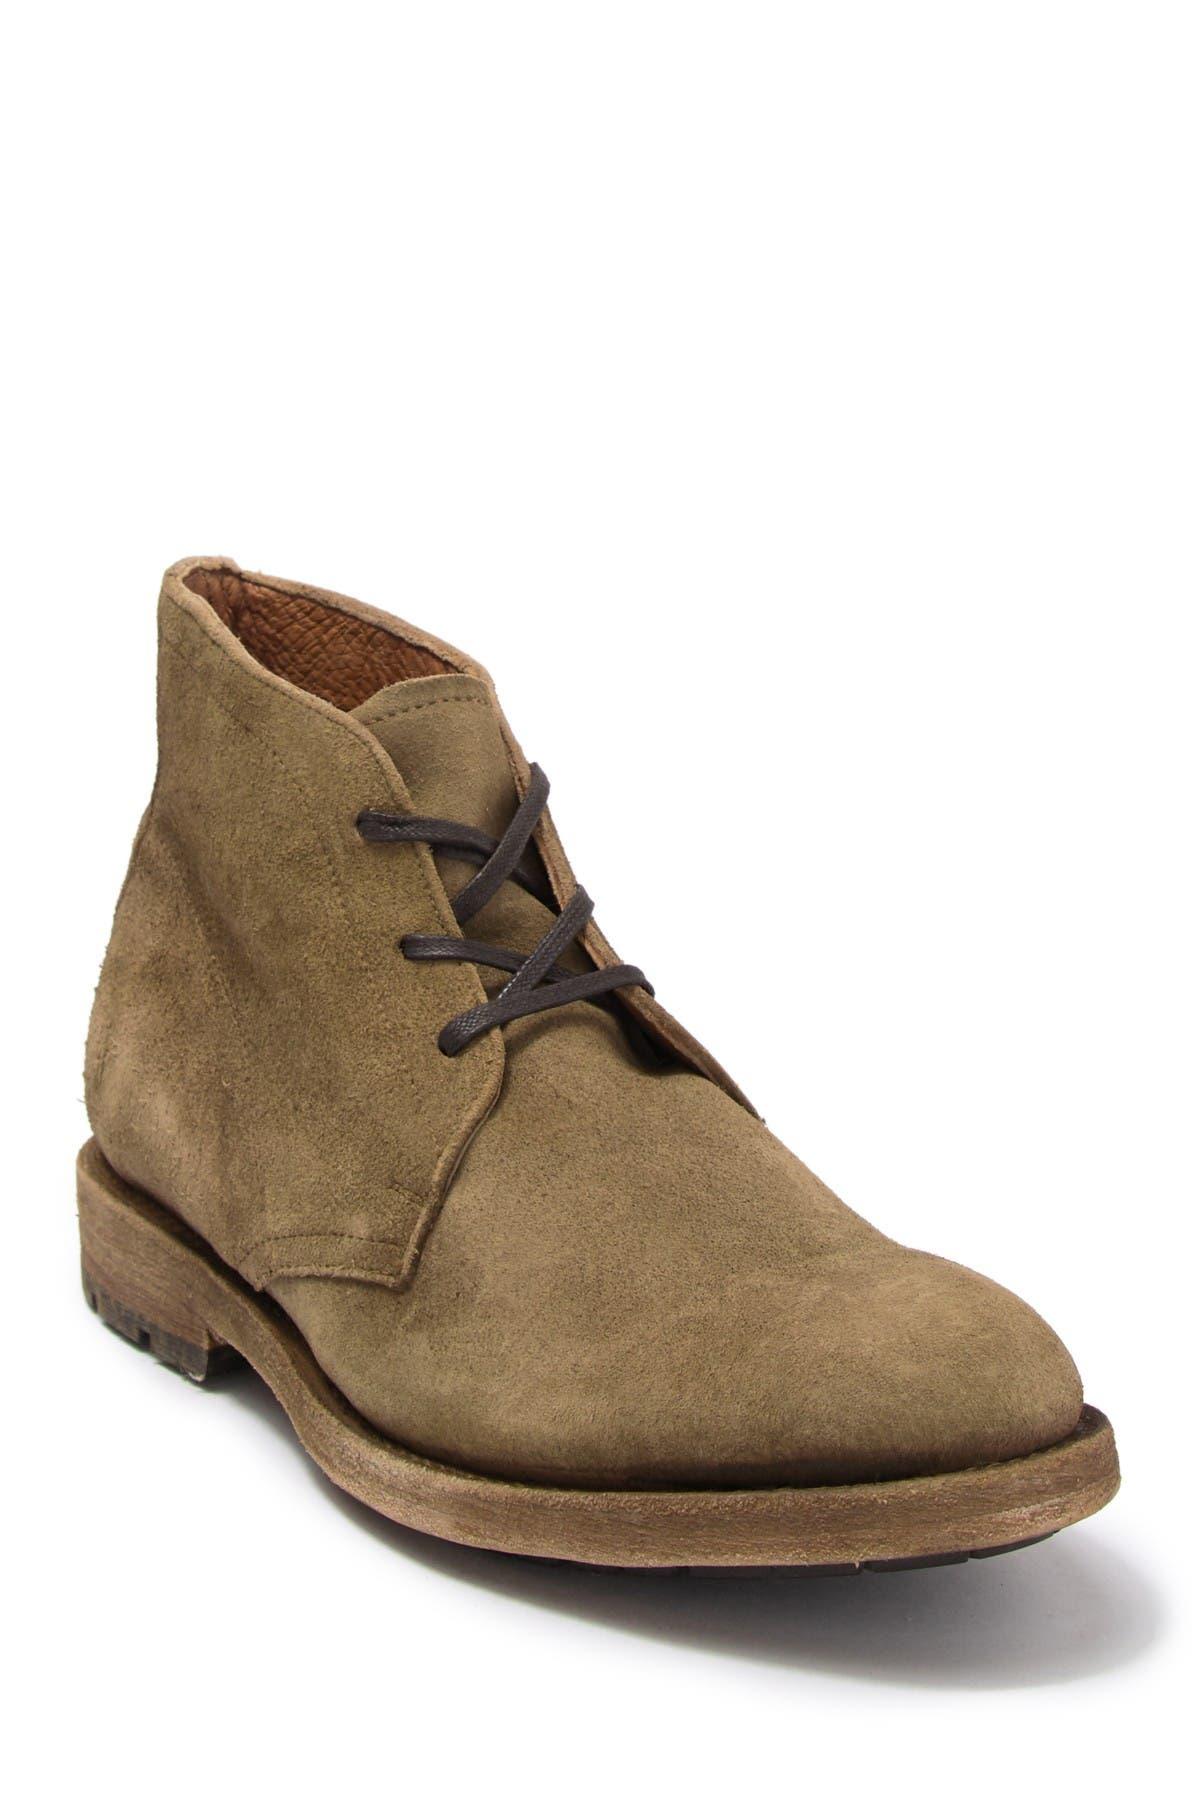 Frye | Bowery Suede Chukka Boot